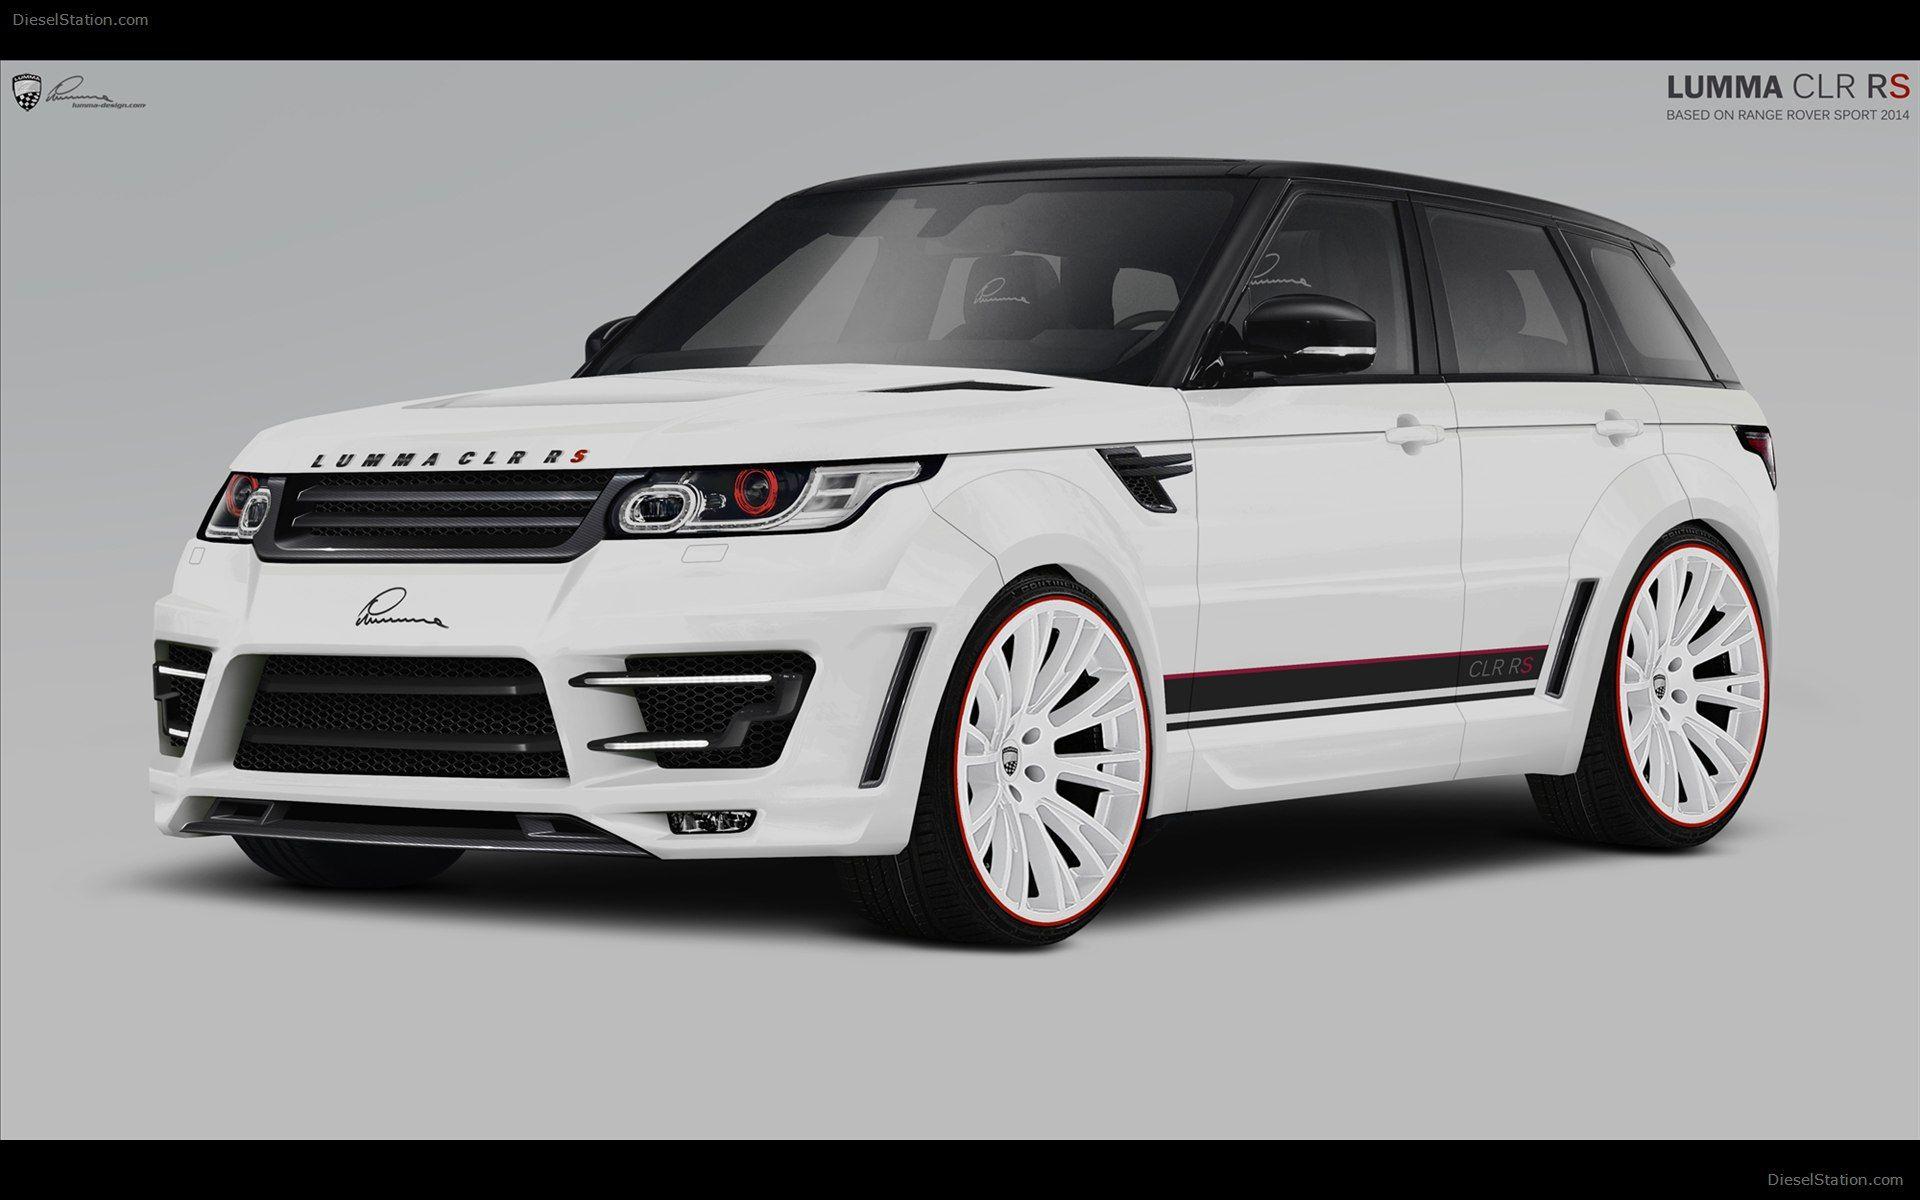 range rover sport 2014 | LUMMA Design Range Rover Sport 2014 Widescreen Exotic Car Wallpaper ...